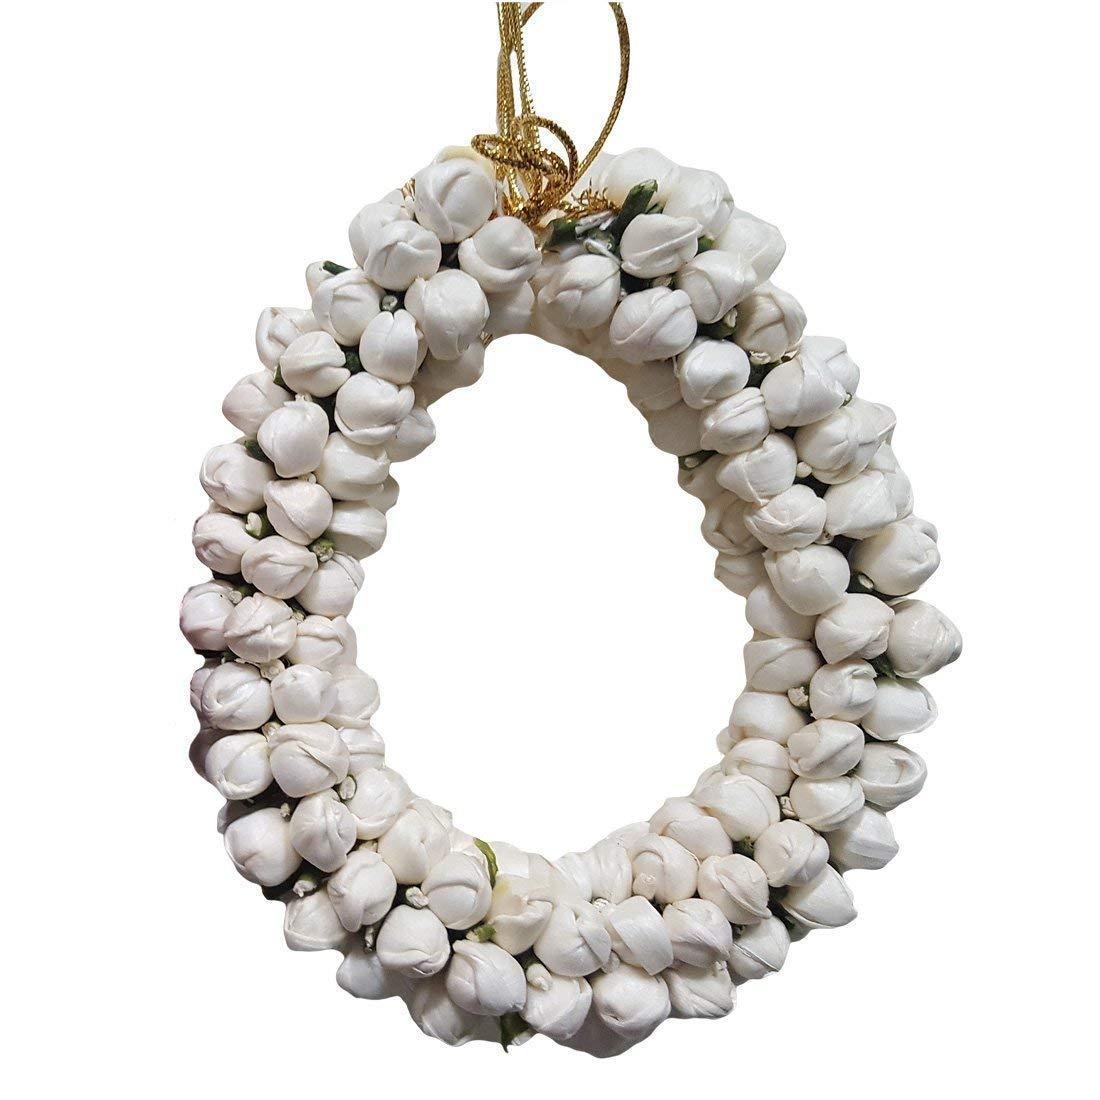 Generic Smark Fashion Shopperrz Jasmine Flower Hair Accessories, White product image